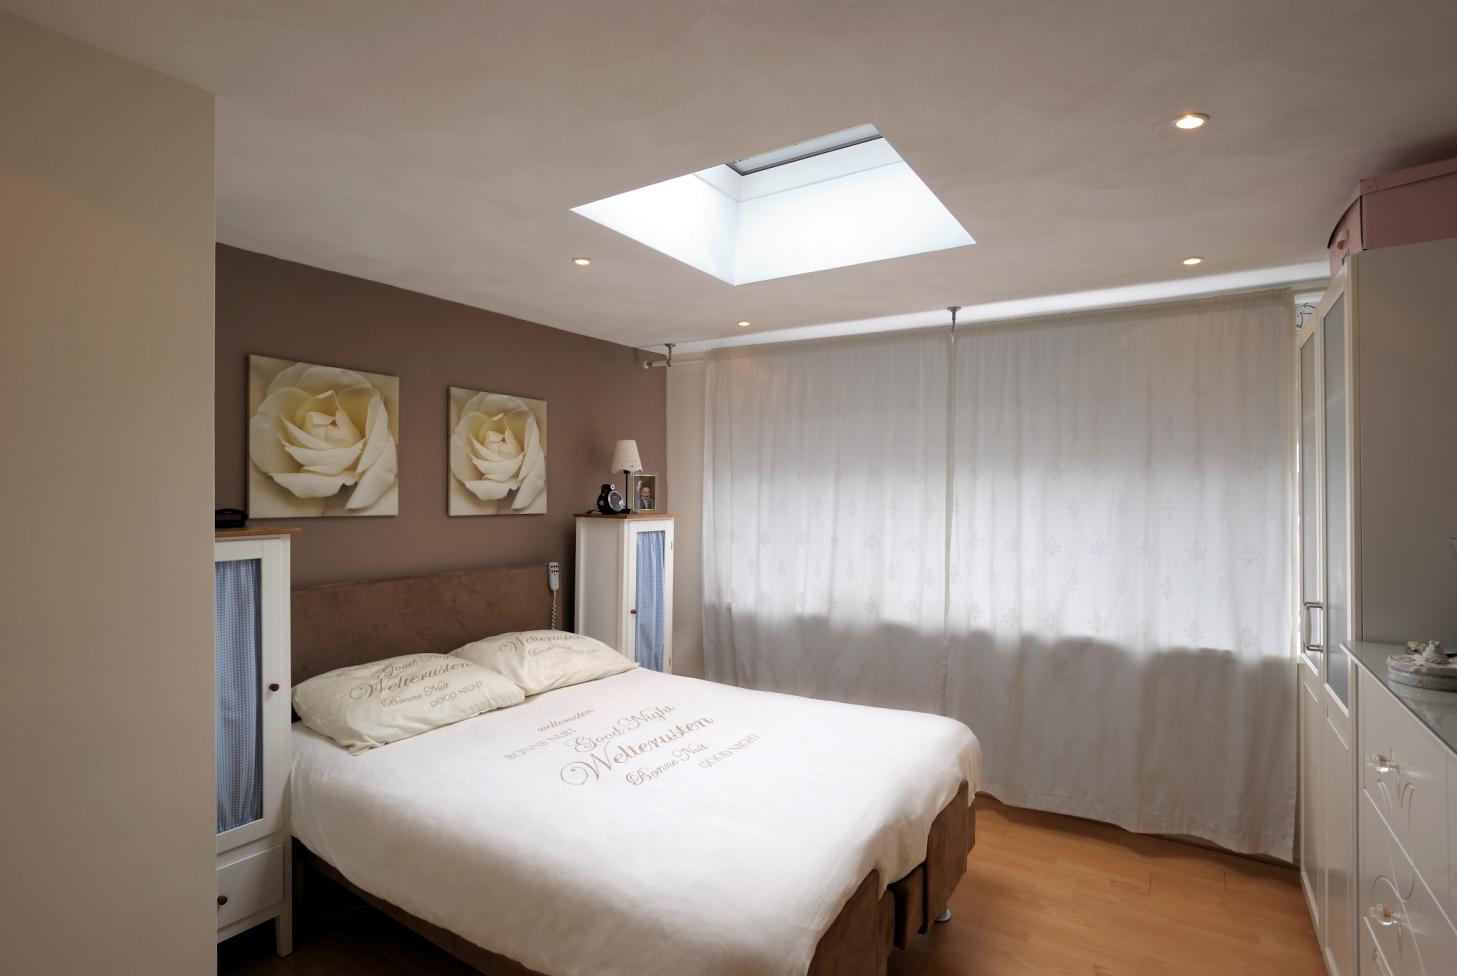 Slaapkamer Zonder Ramen : Lichtkoepels-Dakramen-lichtkoepel slaapkamer